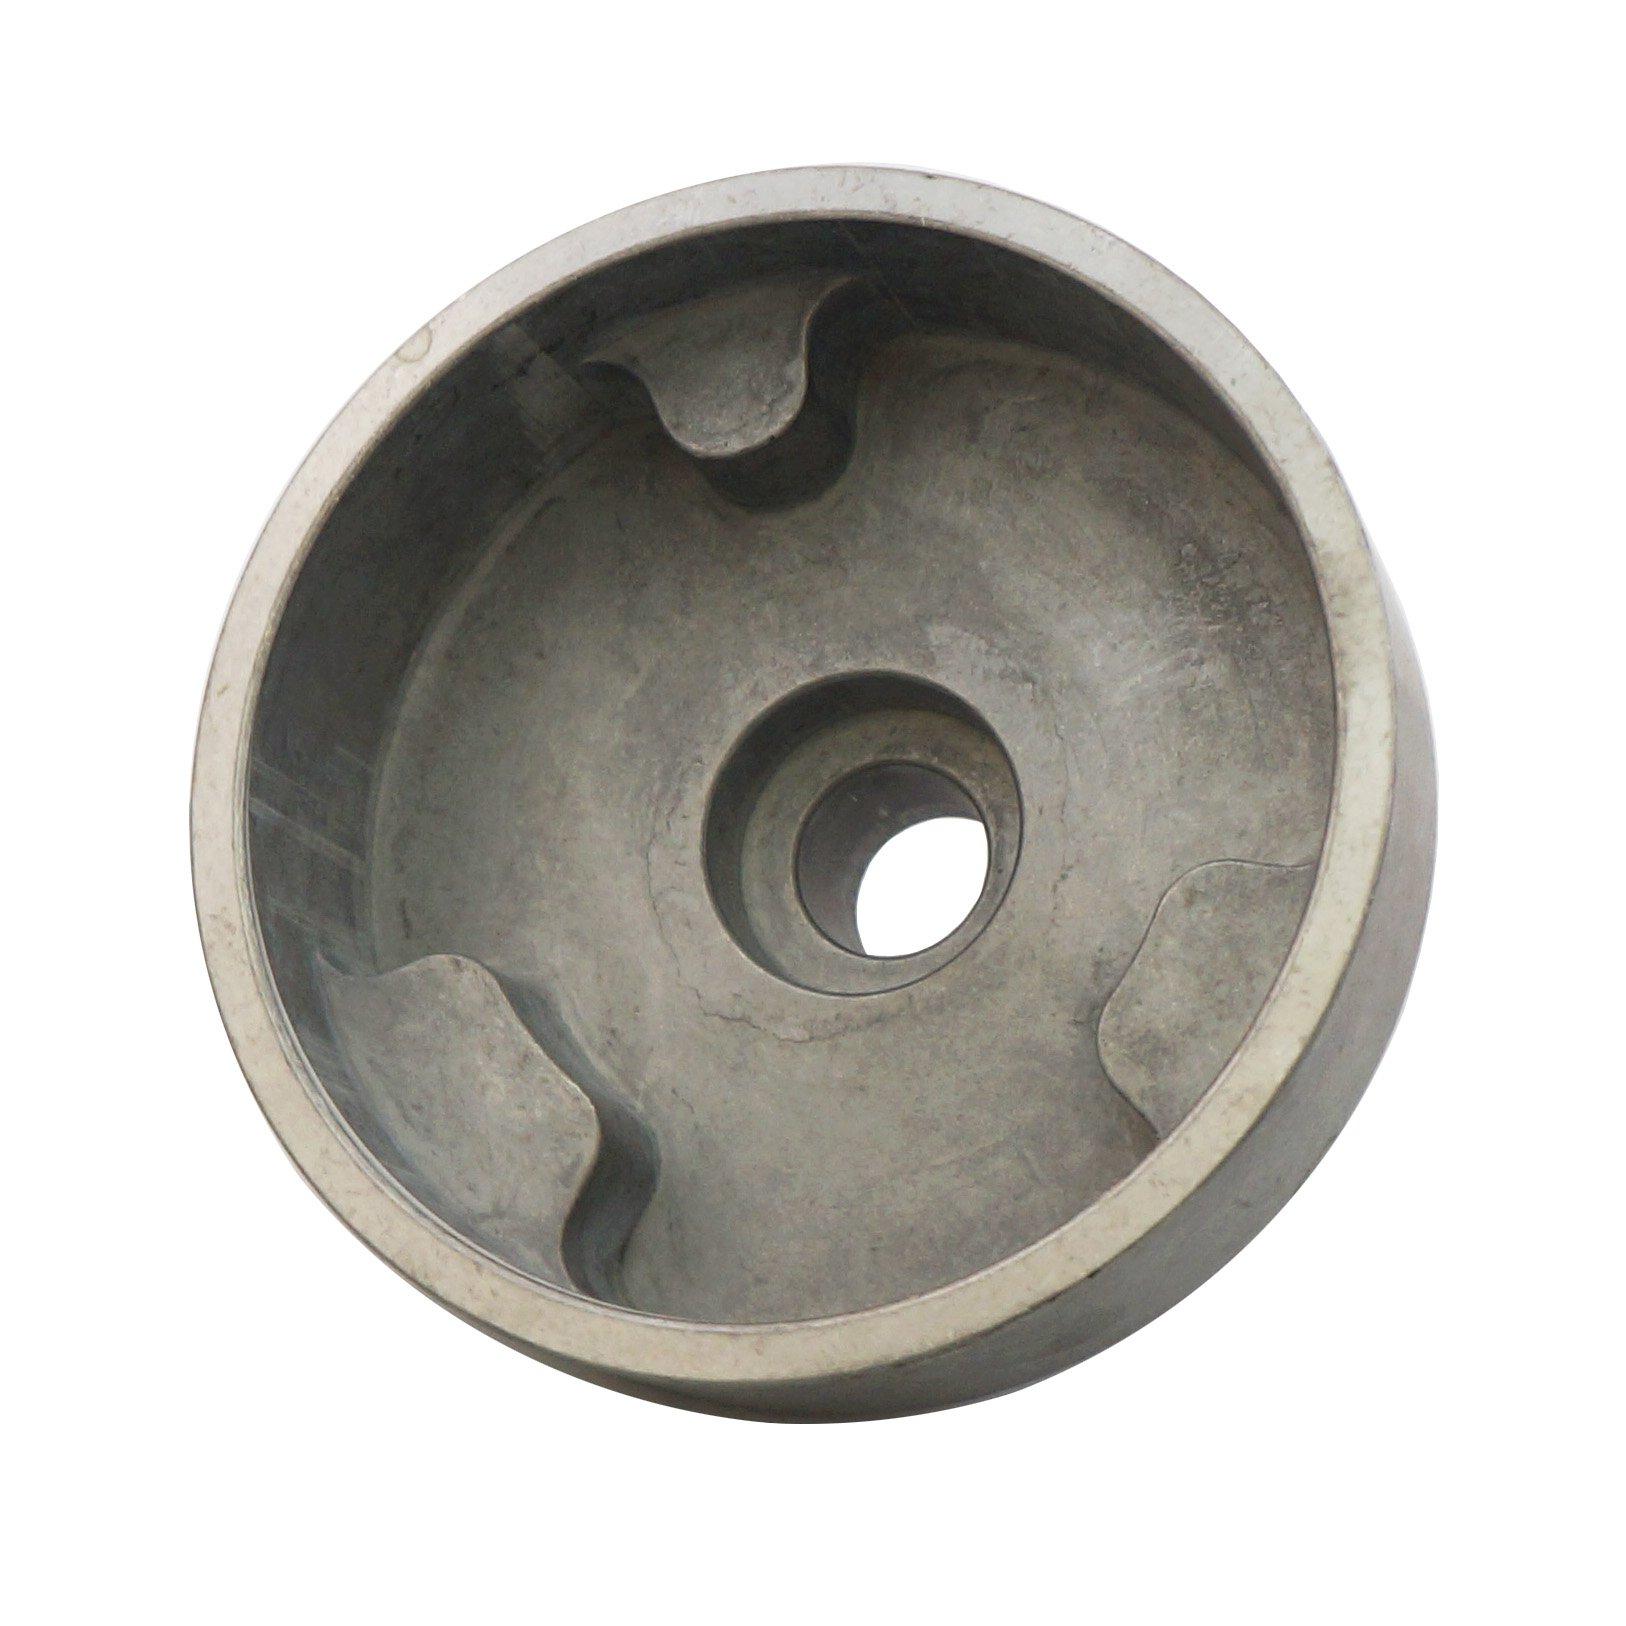 T40269 3 Notch Camshaft Turning Socket